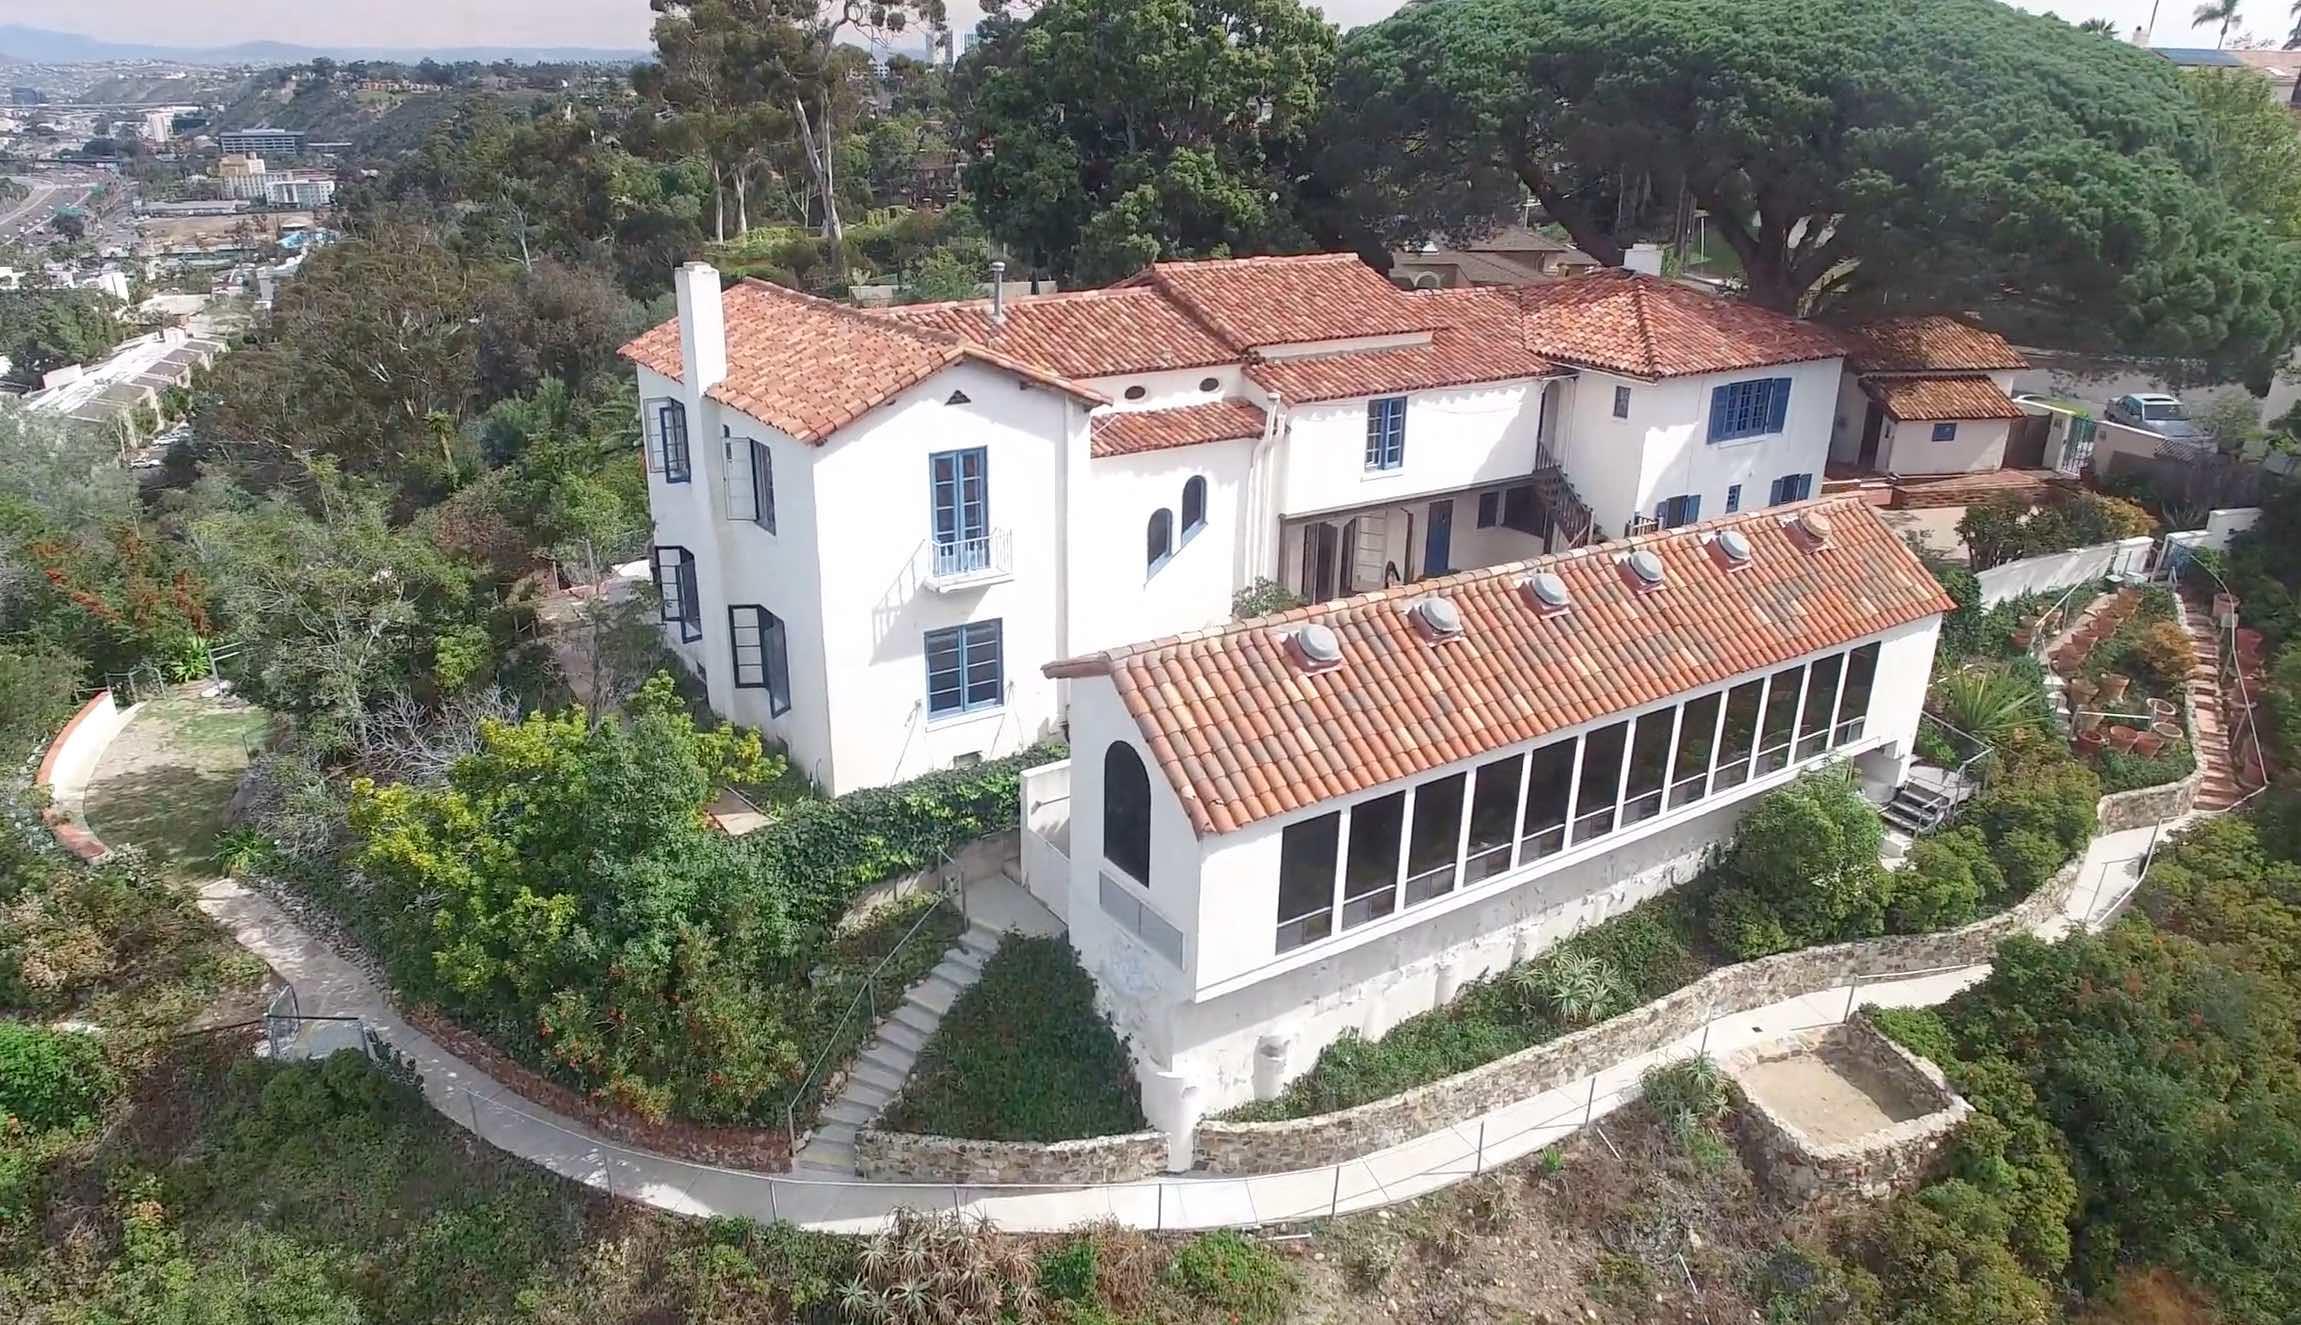 Villa-Hermosa-Aerial-7